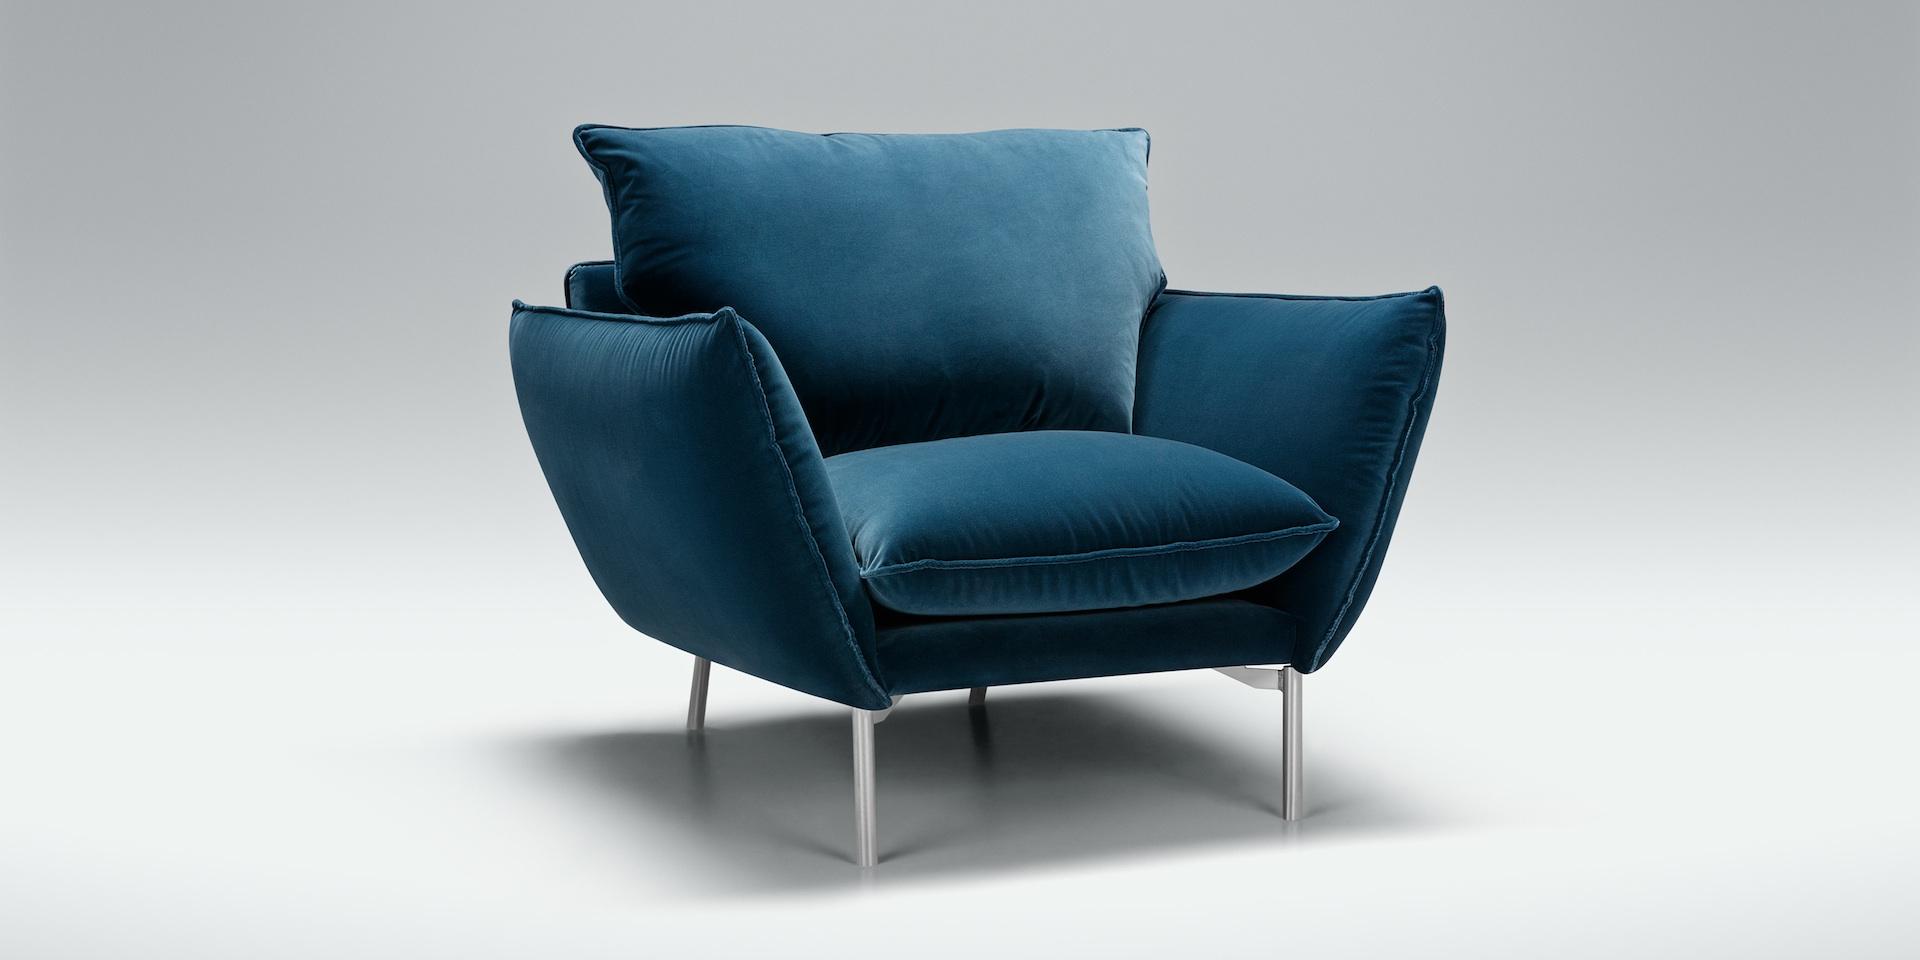 HUGO_shadow_armchair_lario58_blue_2